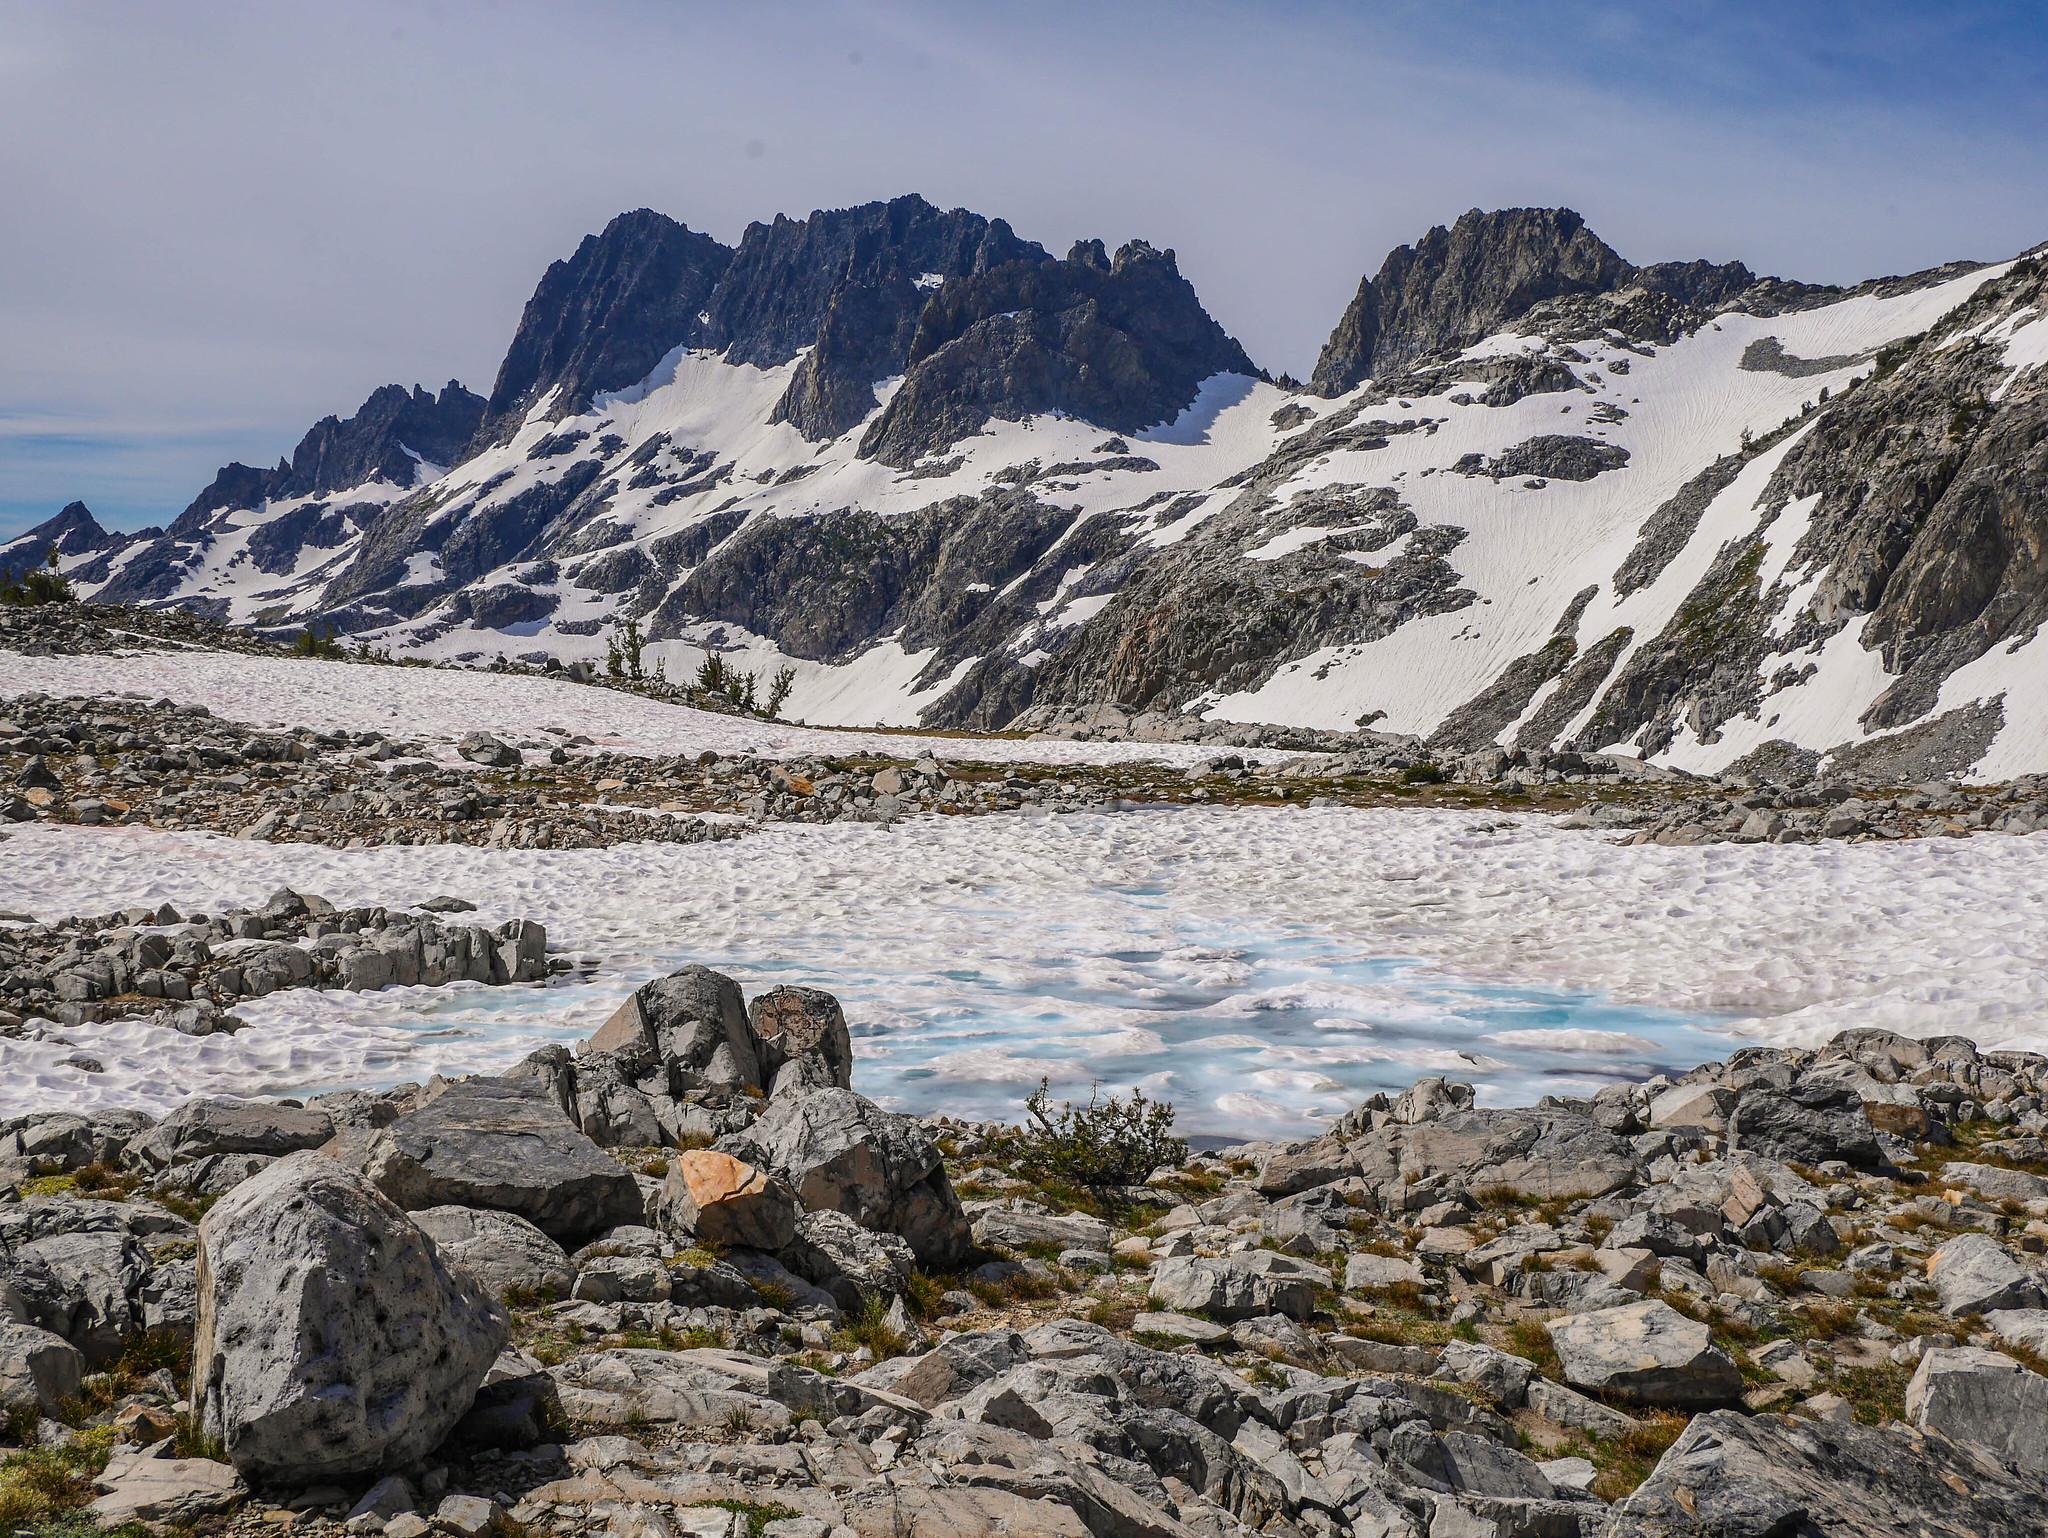 Terrifying snowfield melting into a tarn